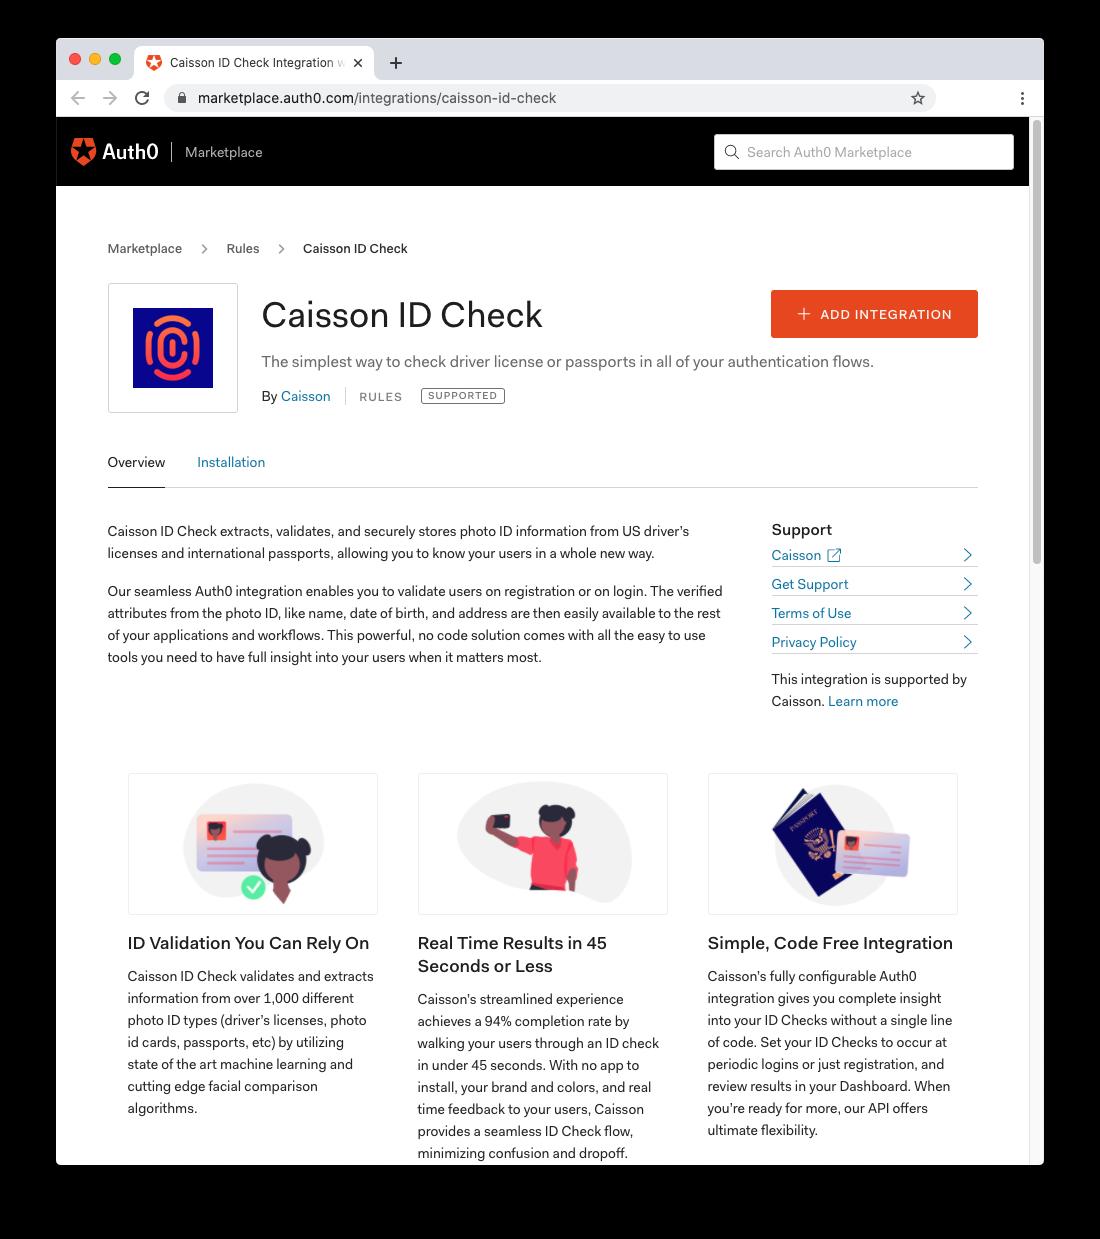 Caisson ID Check